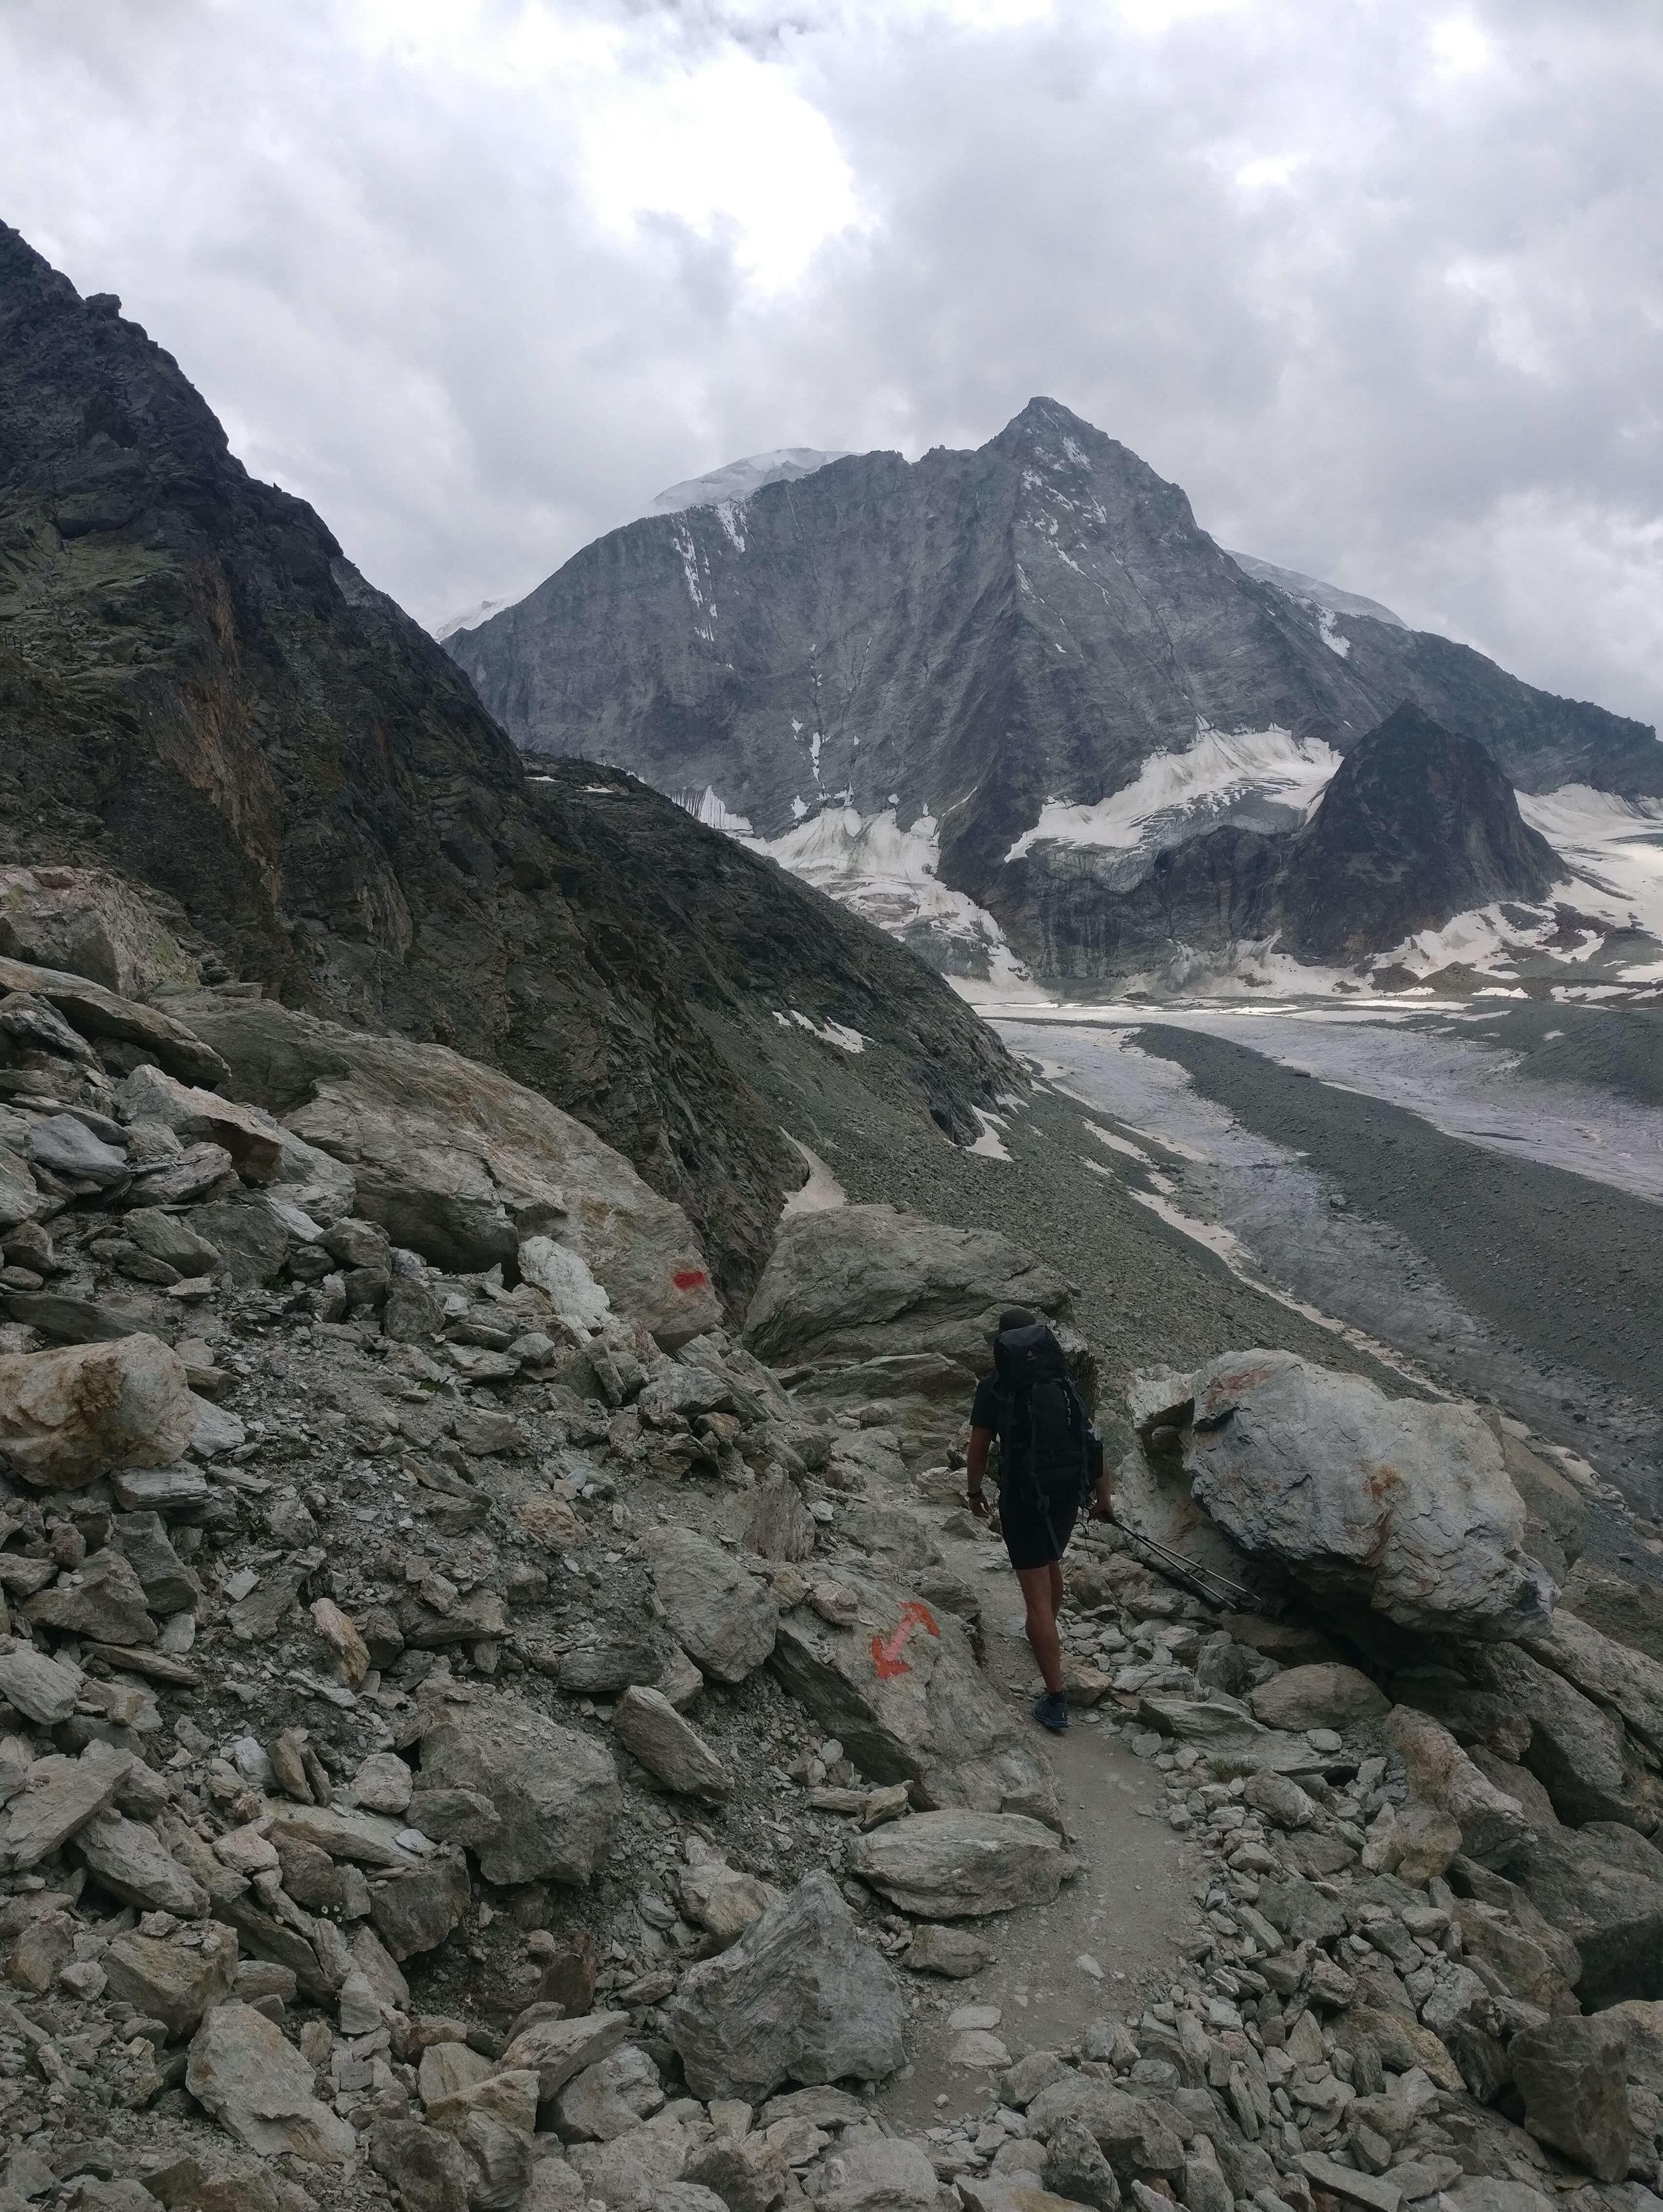 Haute Route Hike: Crossing the boulder field upto Col de Reidmatten where I ran out of water